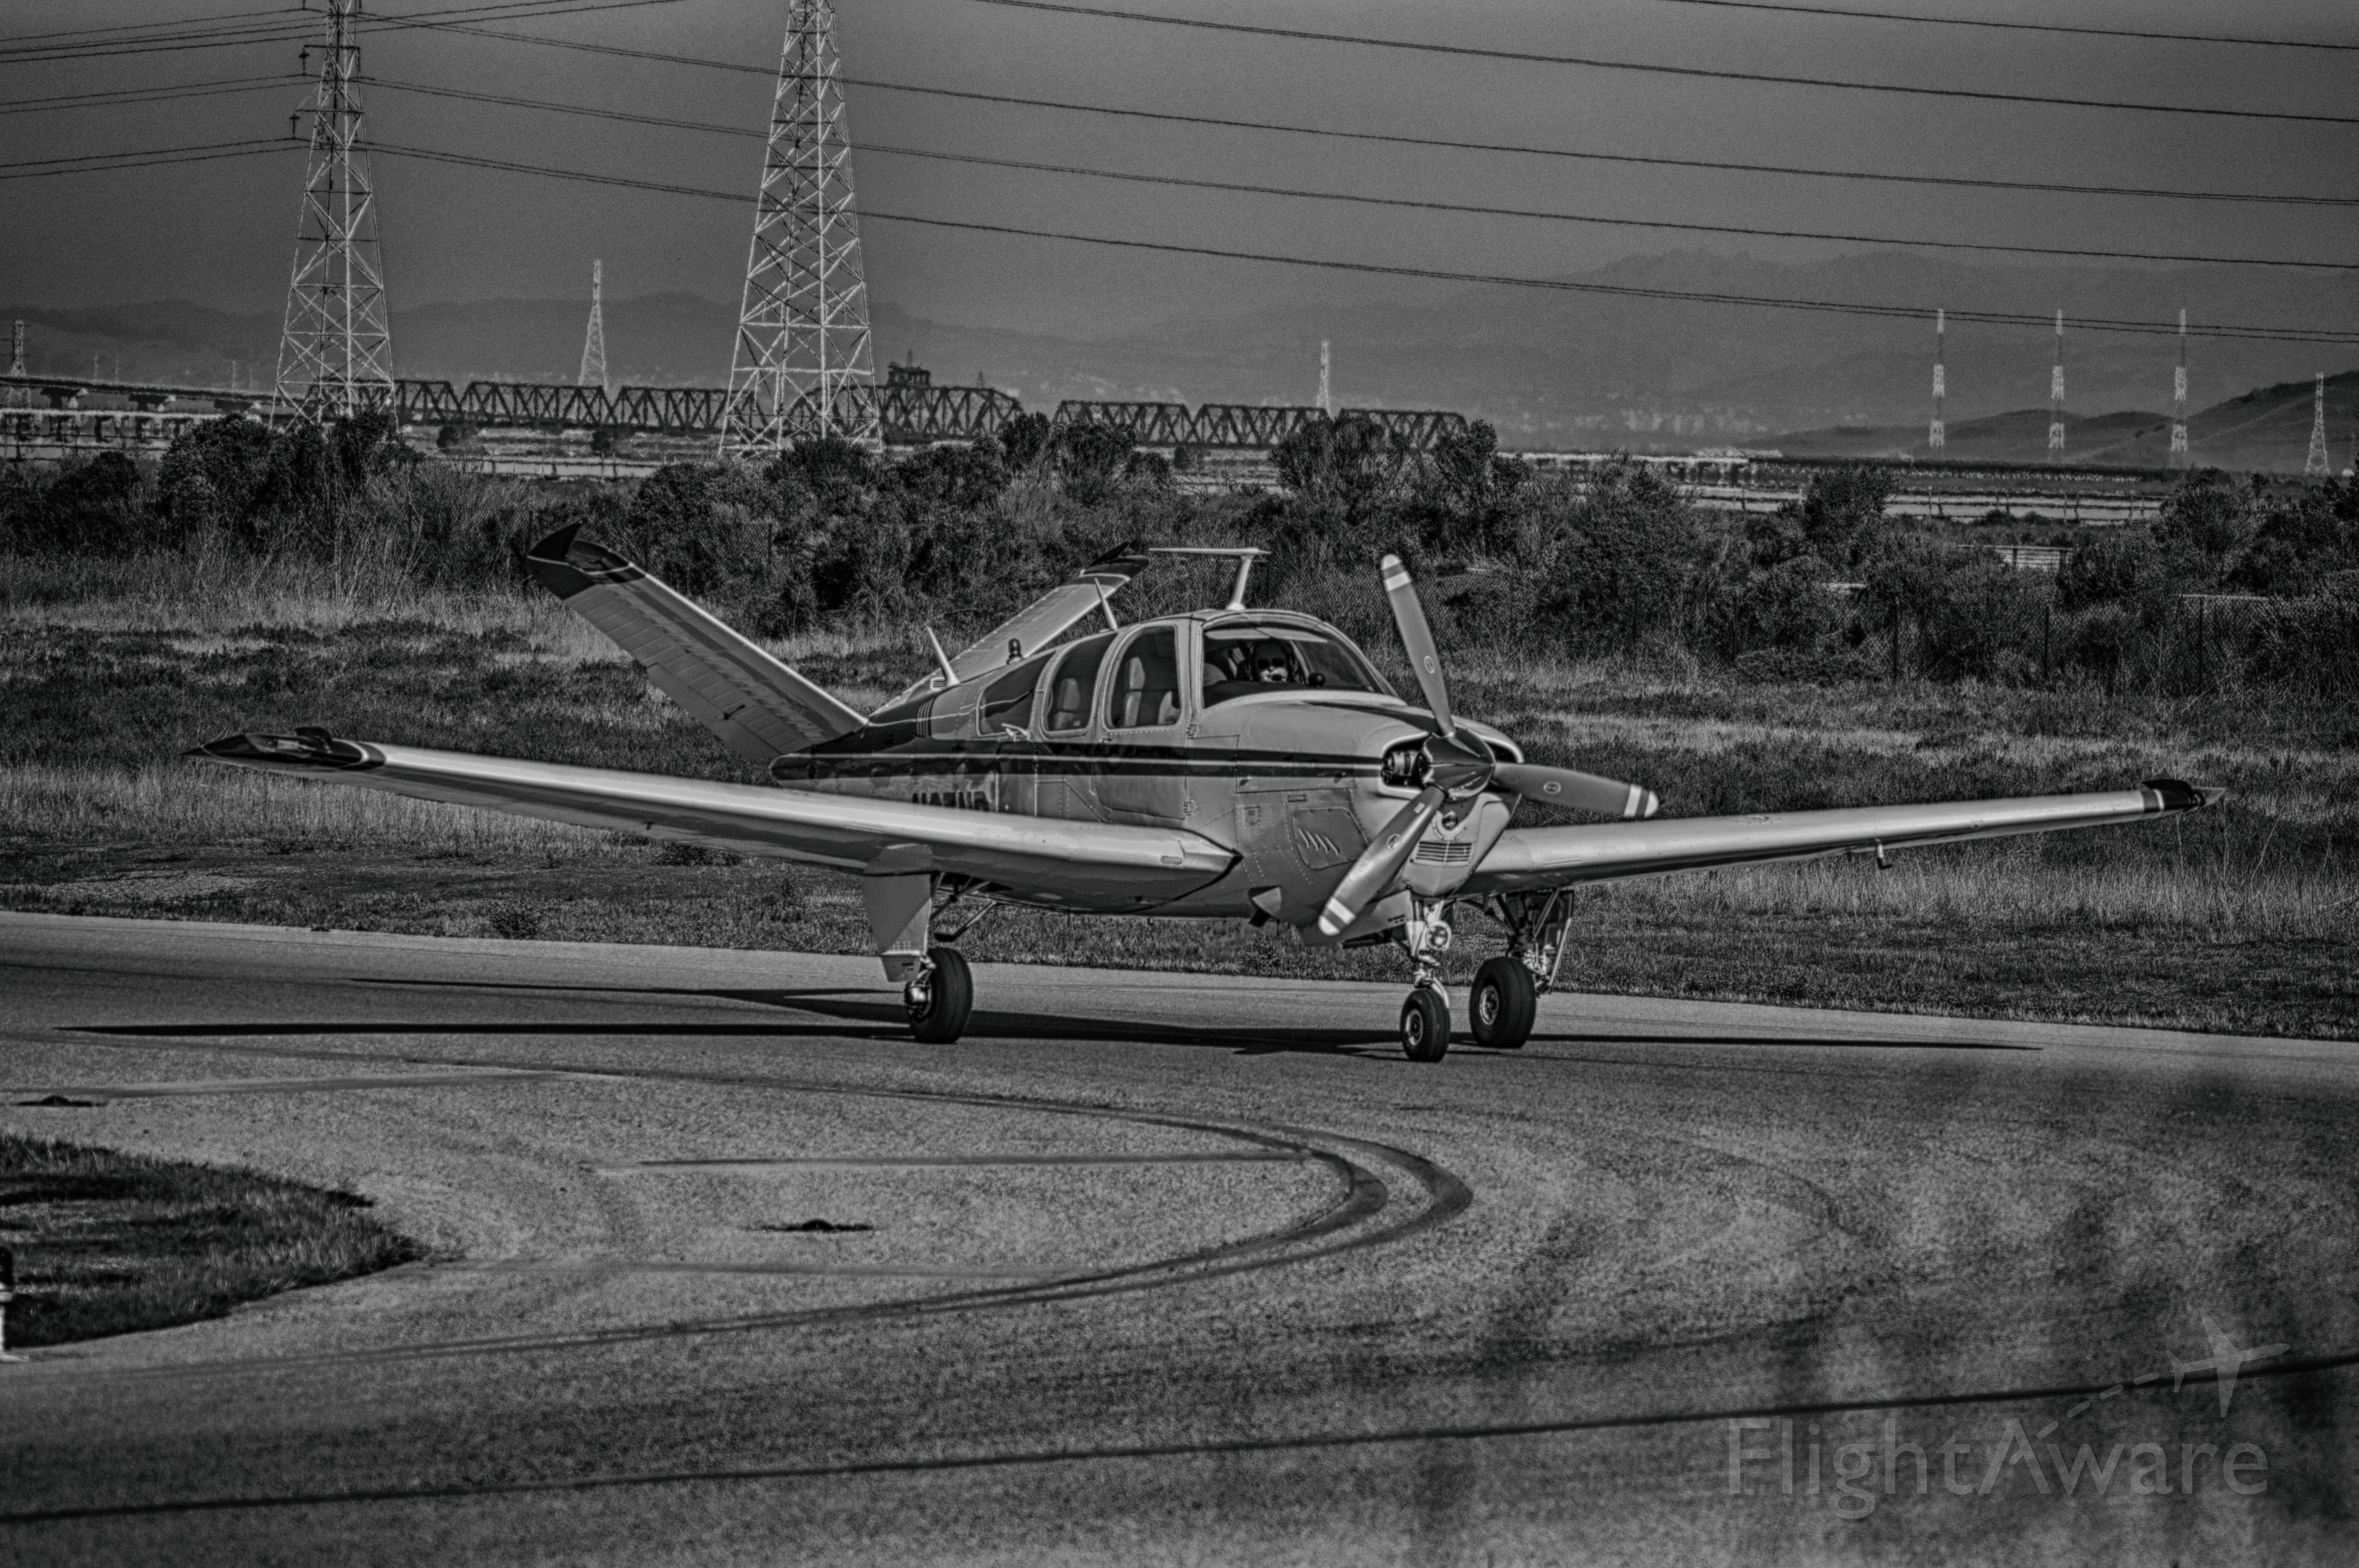 — — - V Tail Bonanza rolling off the runway at KPAO